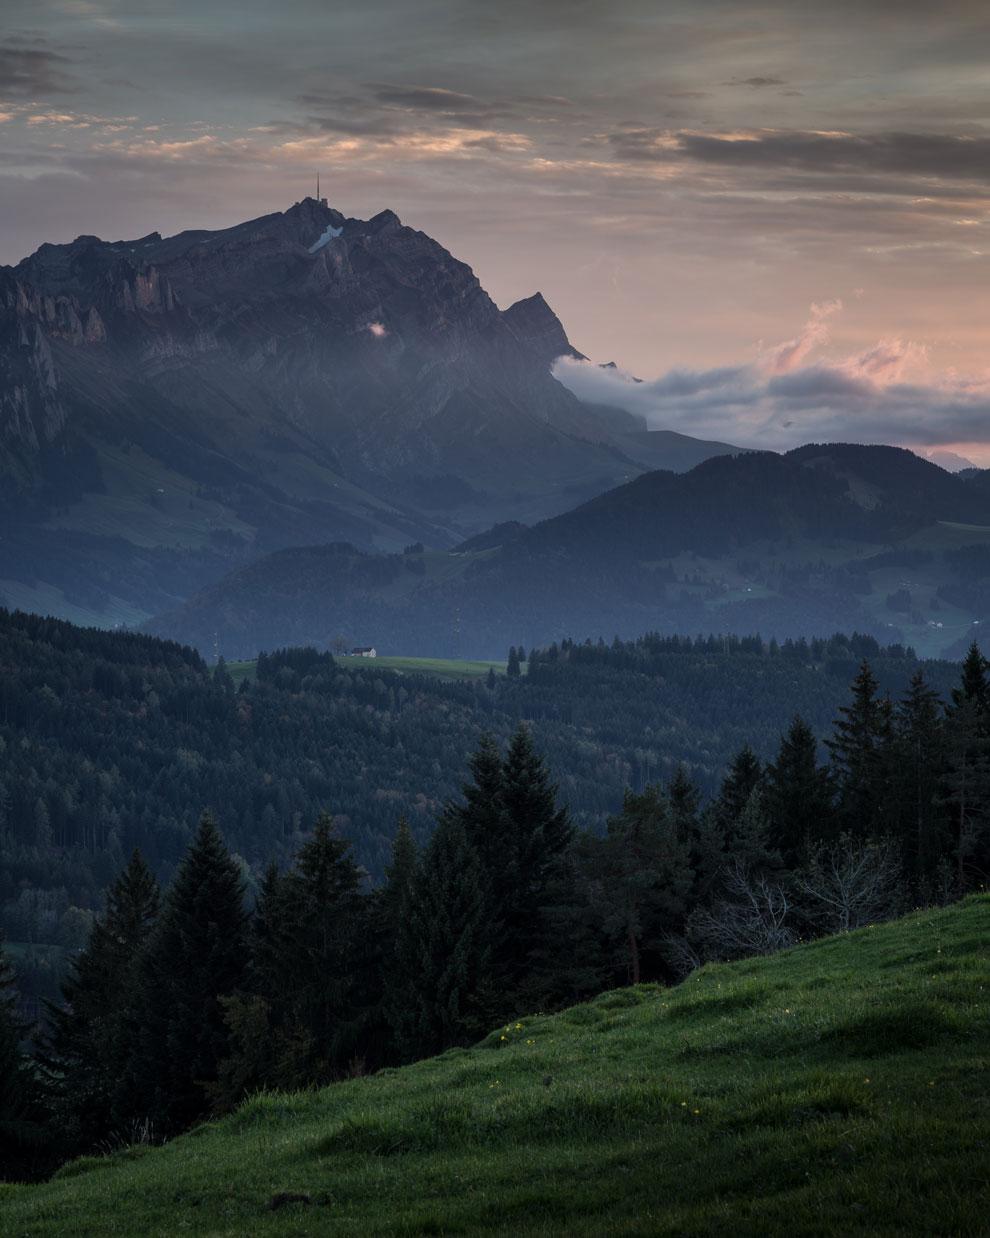 Appenzellerland, Okt 2014